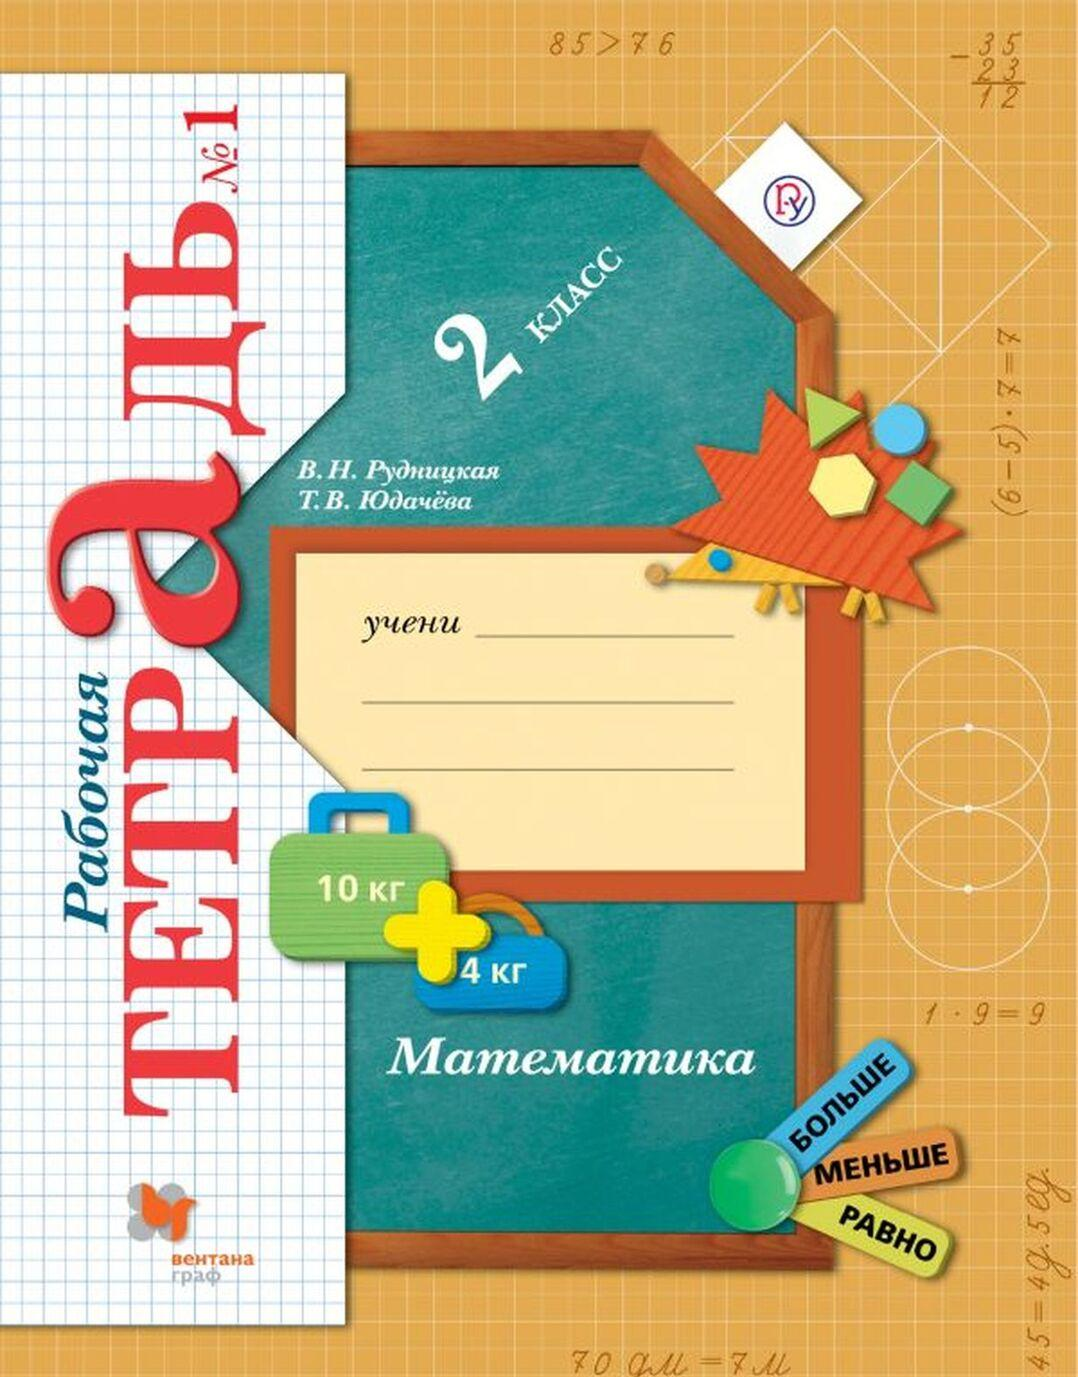 Matematika. 2 klass. Rabochaja tetrad. V 2-kh chastjakh. Chast 1 | Rudnitskaja Viktorija Naumovna, Judacheva Tatjana Vladimirovna